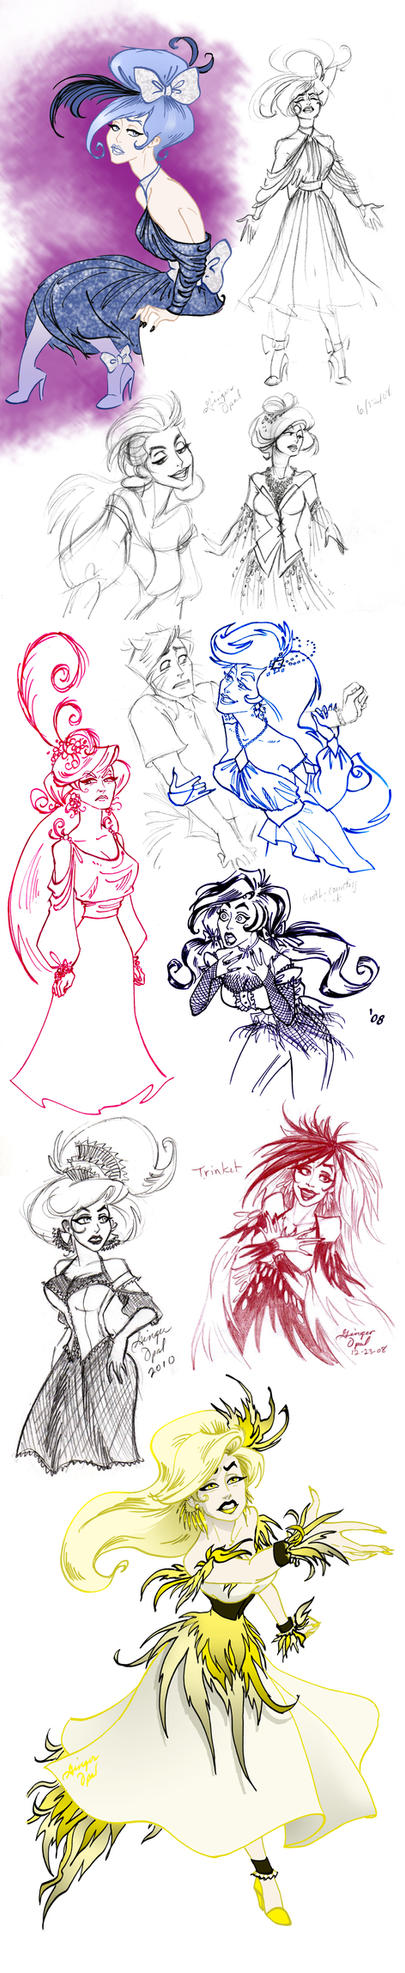 A Sketchdump Full of Trinket by GingerOpal